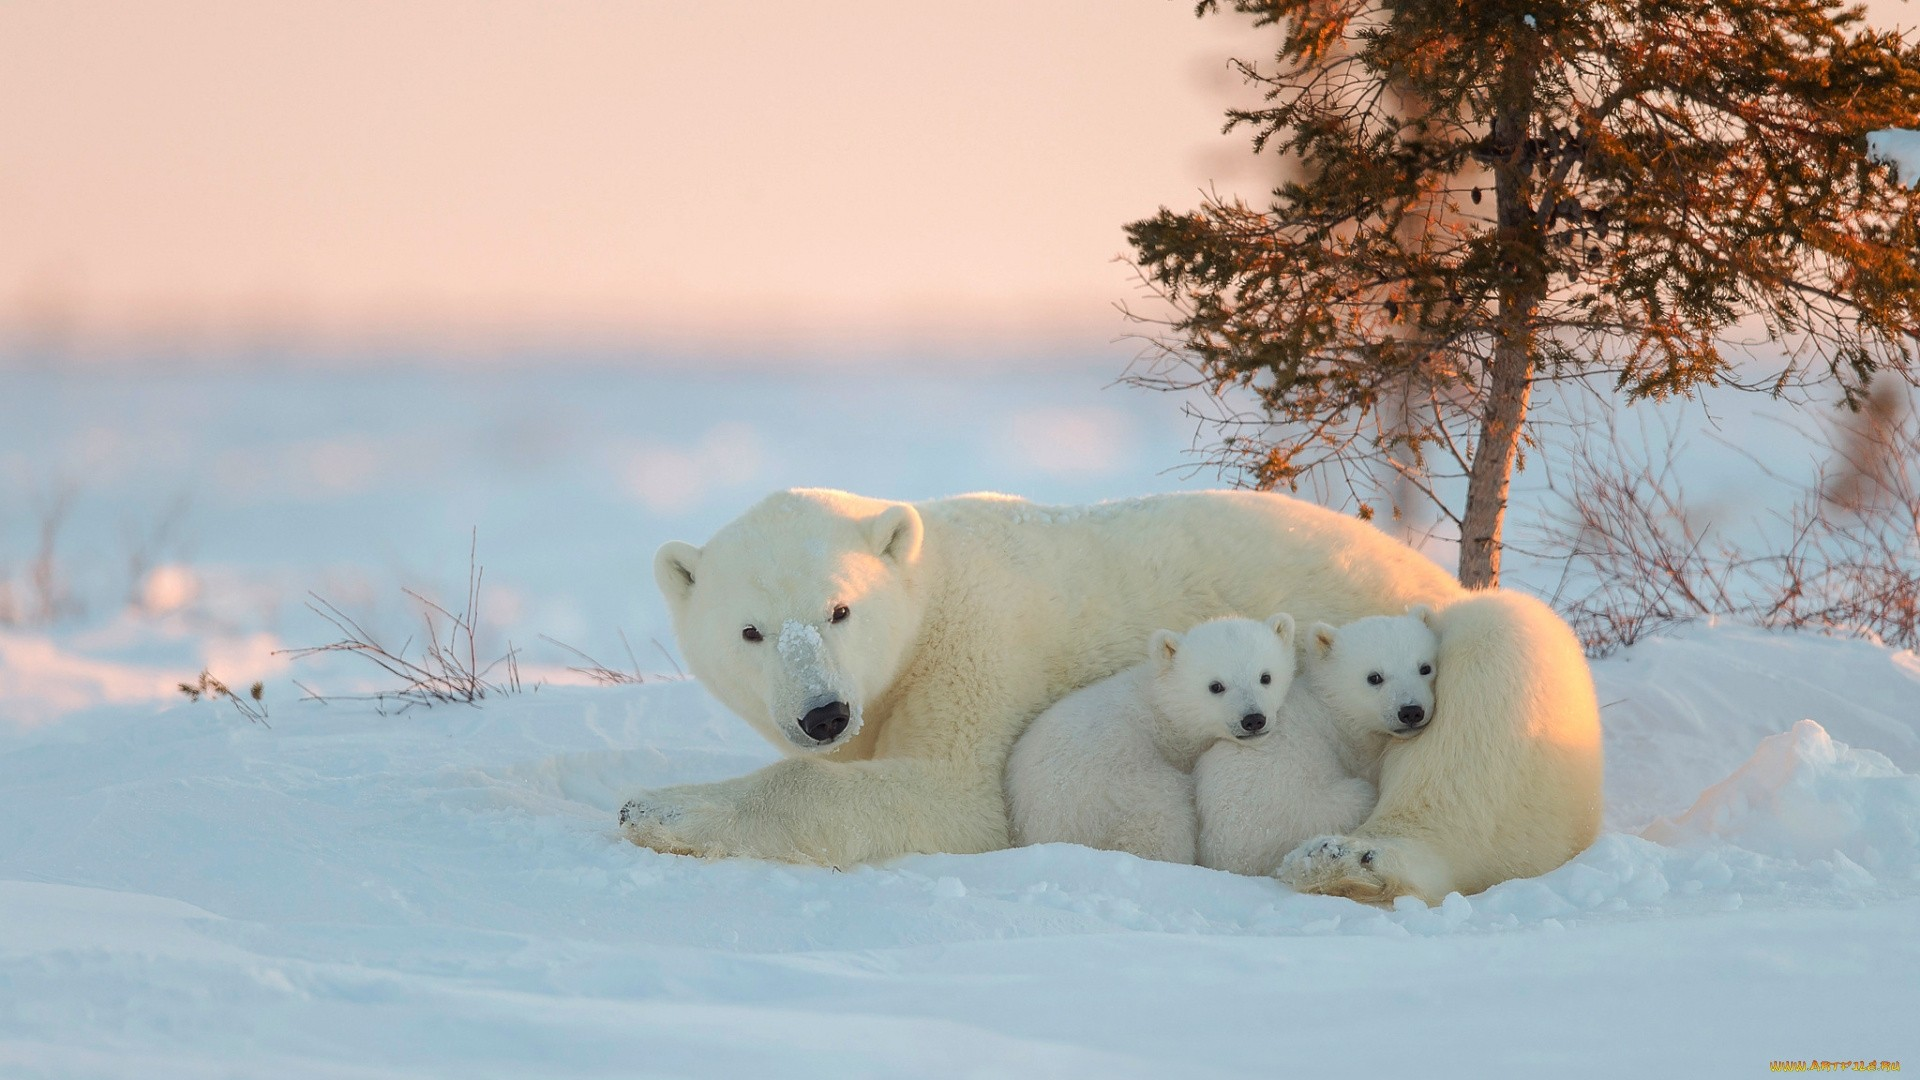 Polar Bear Wallpaper image hd